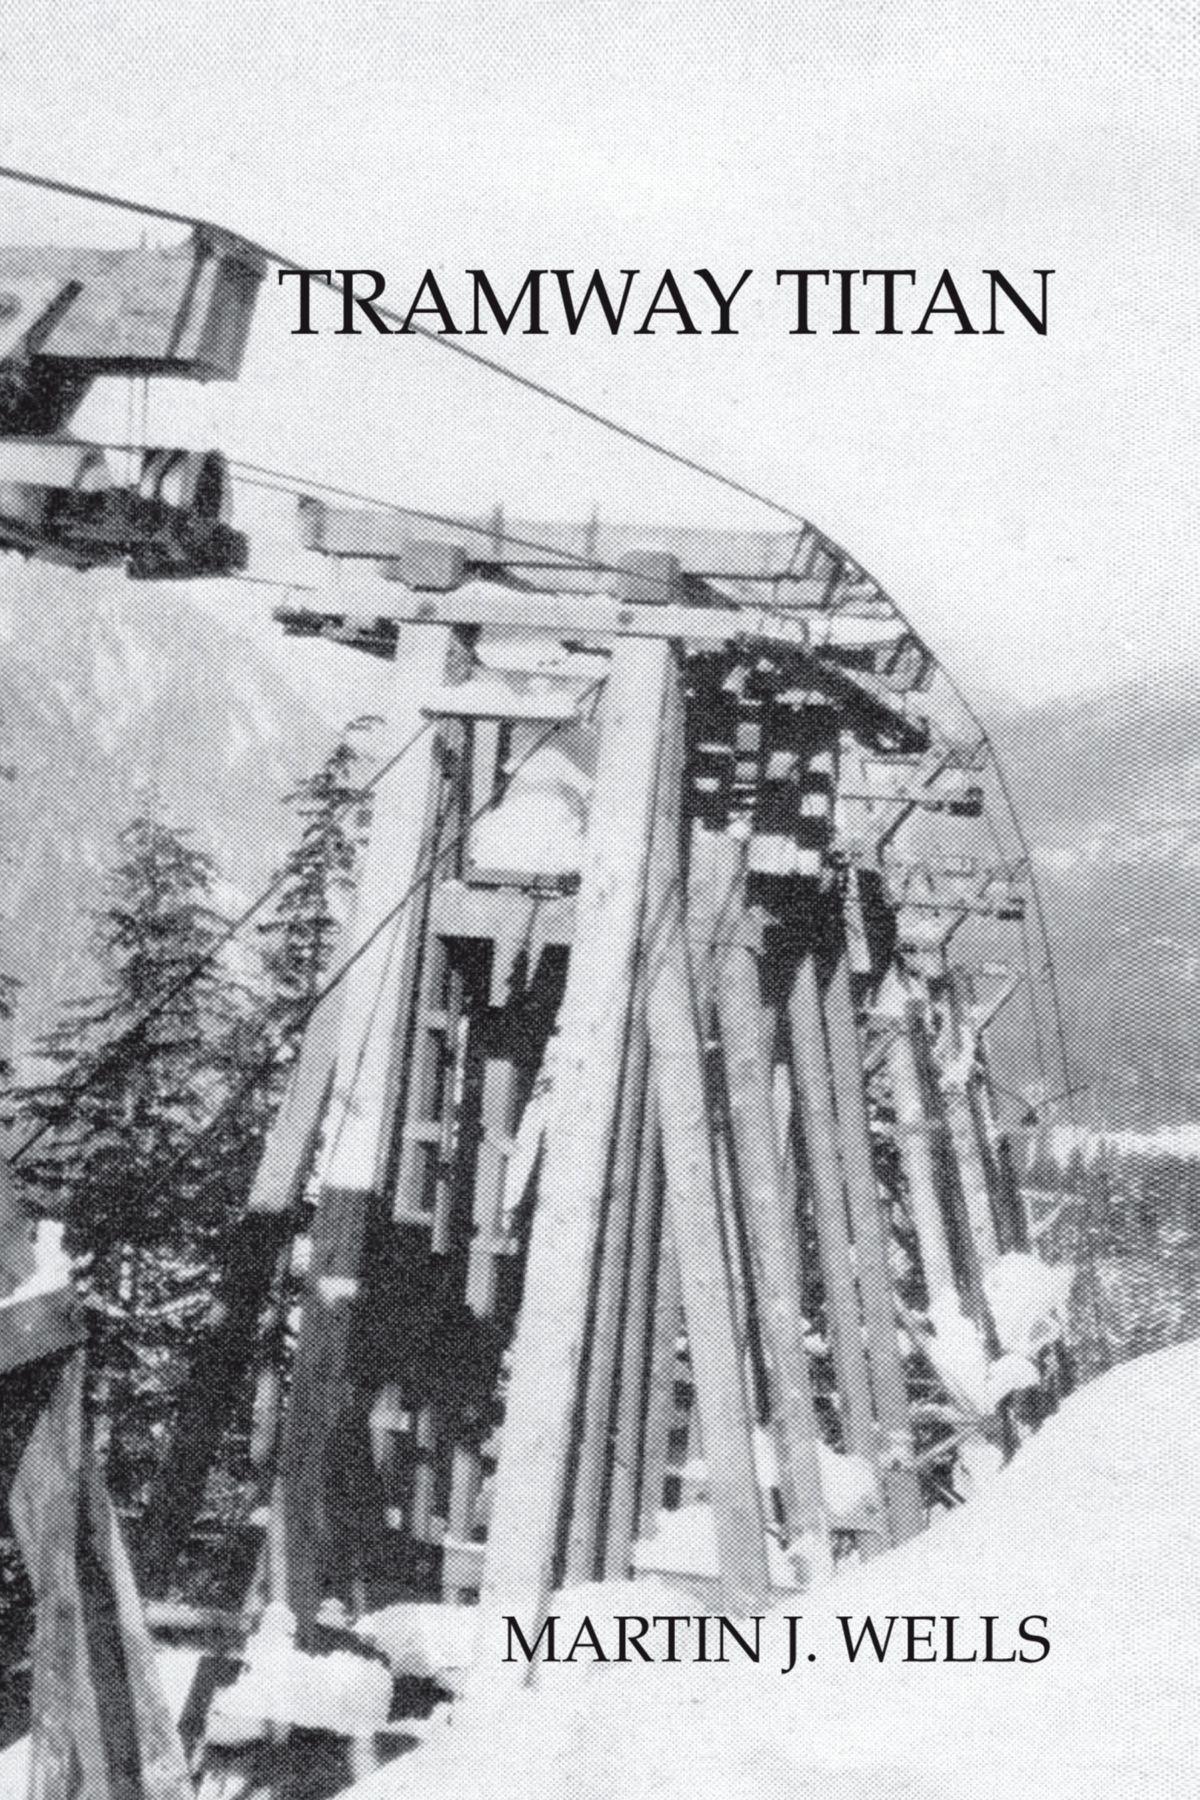 Tramway Titan